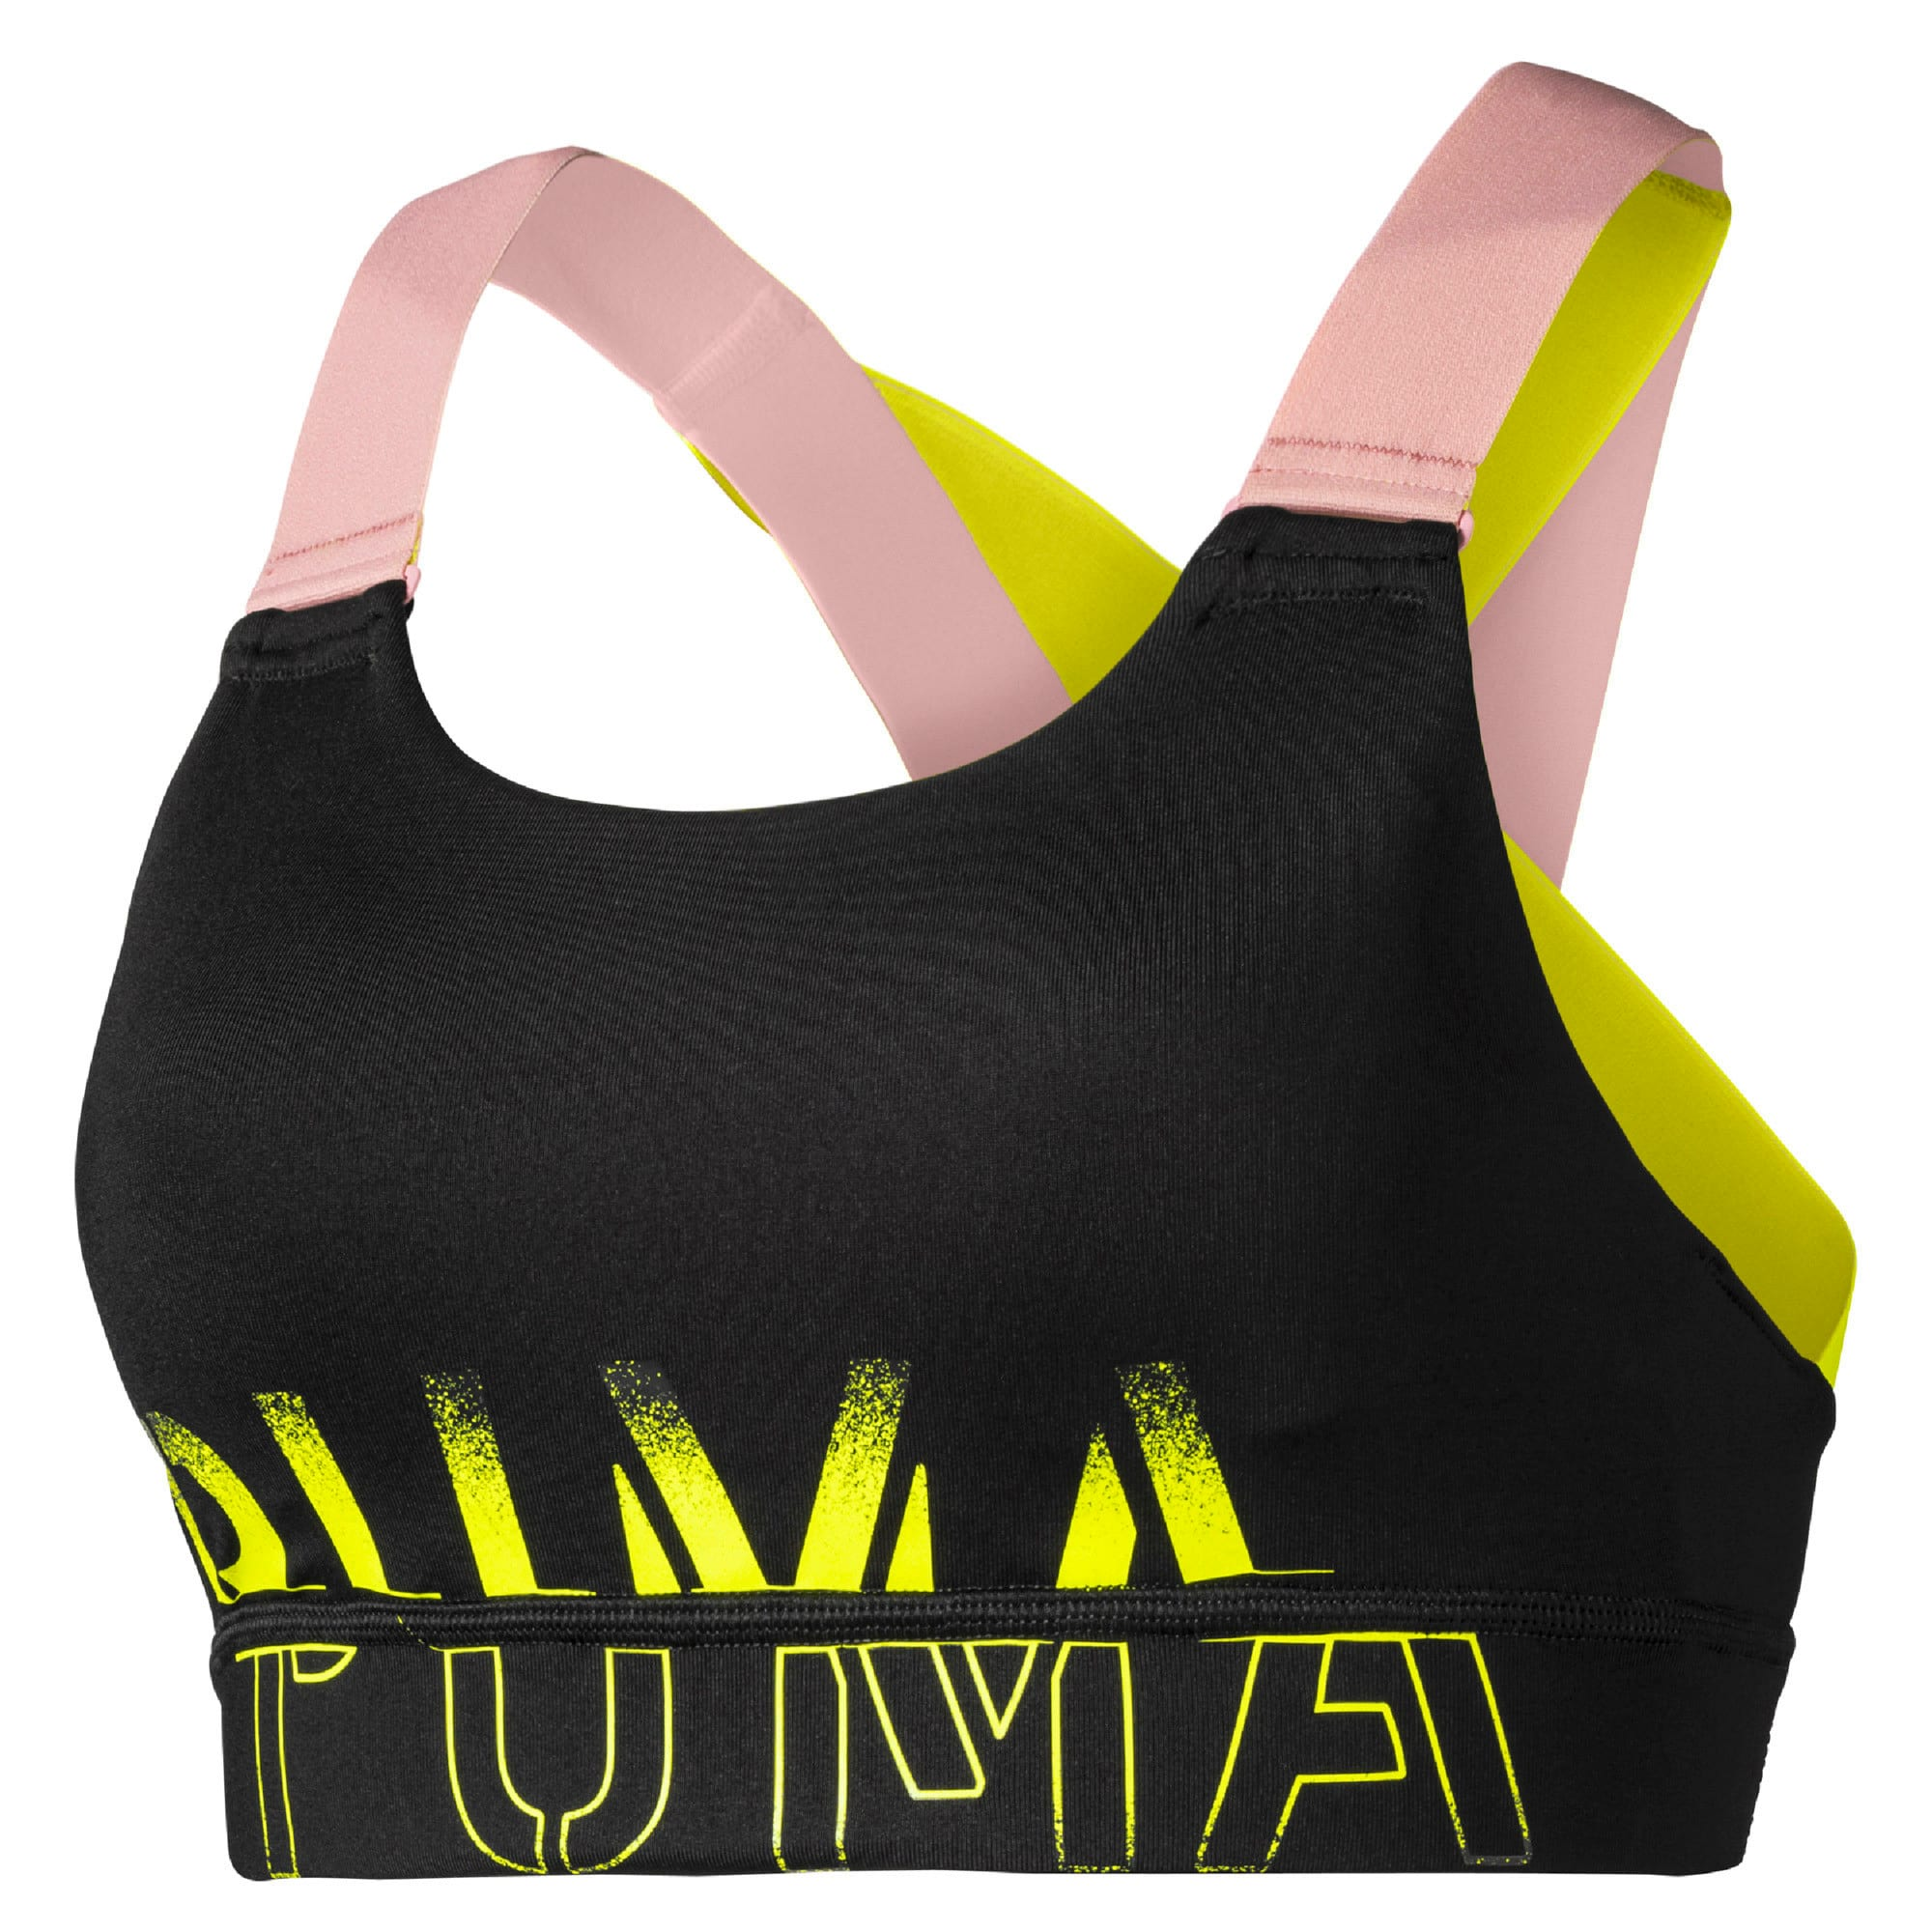 Thumbnail 4 of Feel It Women's Training Bra, Black-BridalRose-Yellowalert, medium